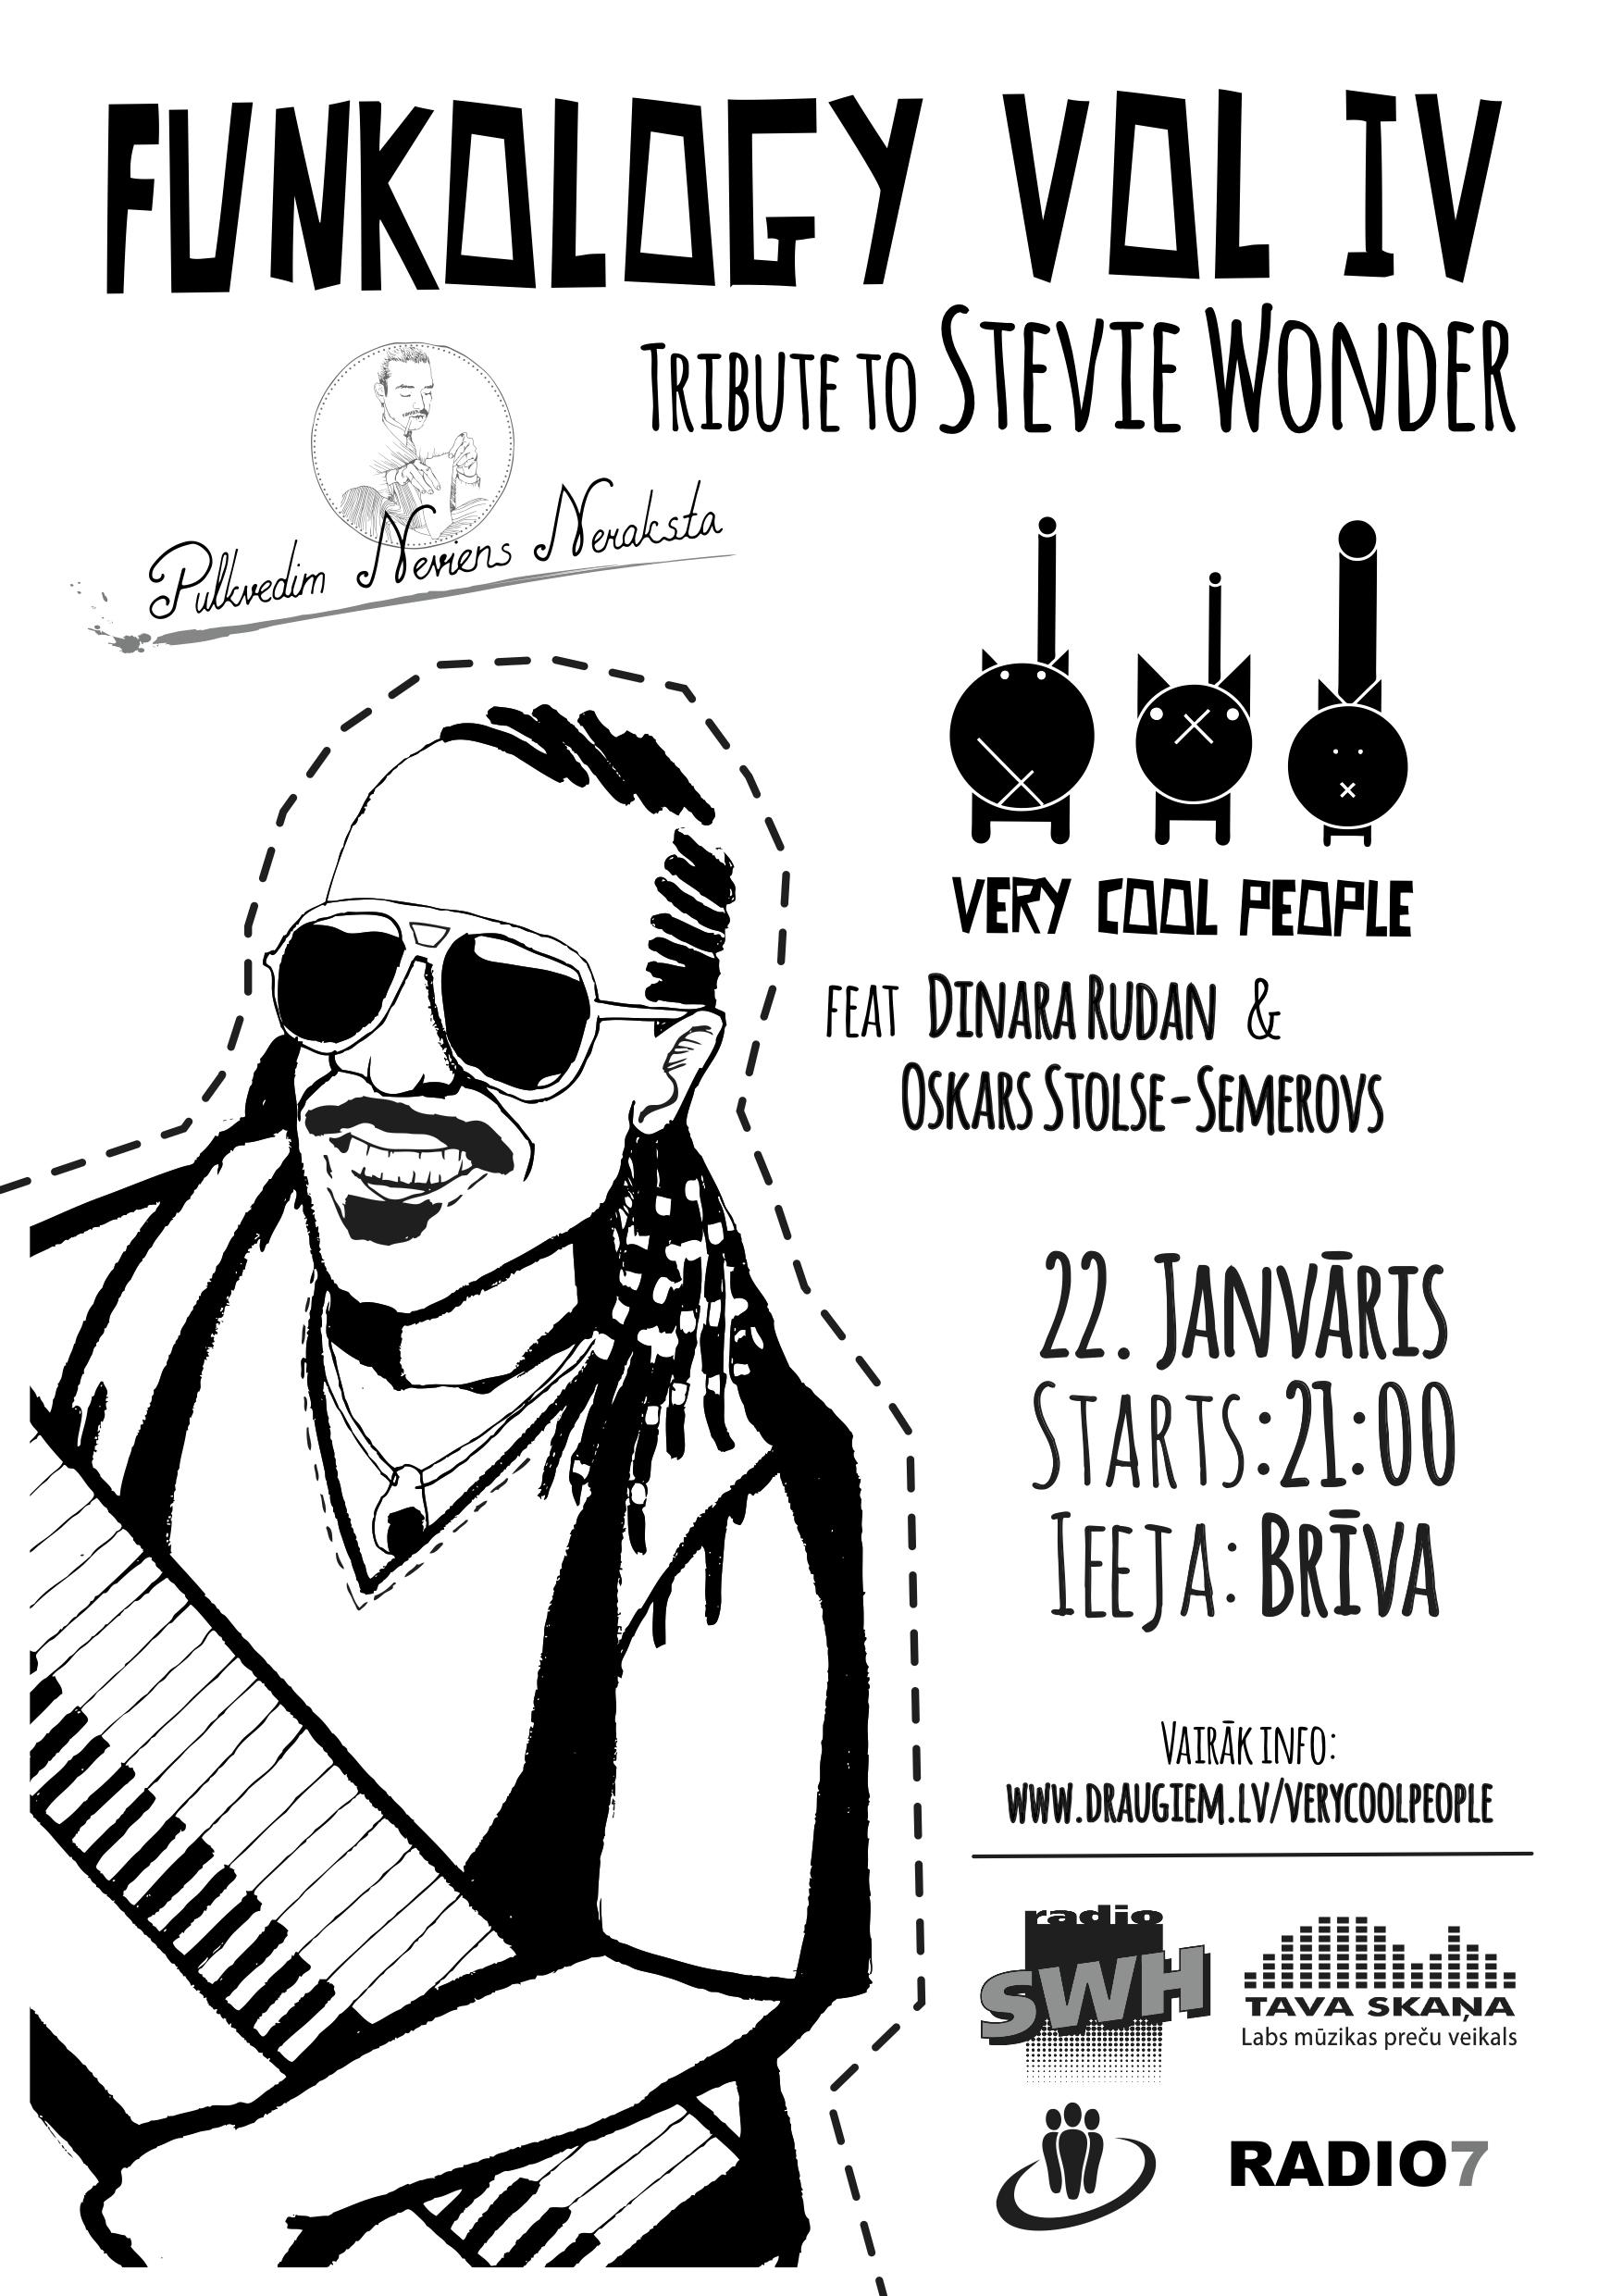 Funkology Vol 4 (tribute to Stevie Wonder) @ Pulkvedim neviens neraksta